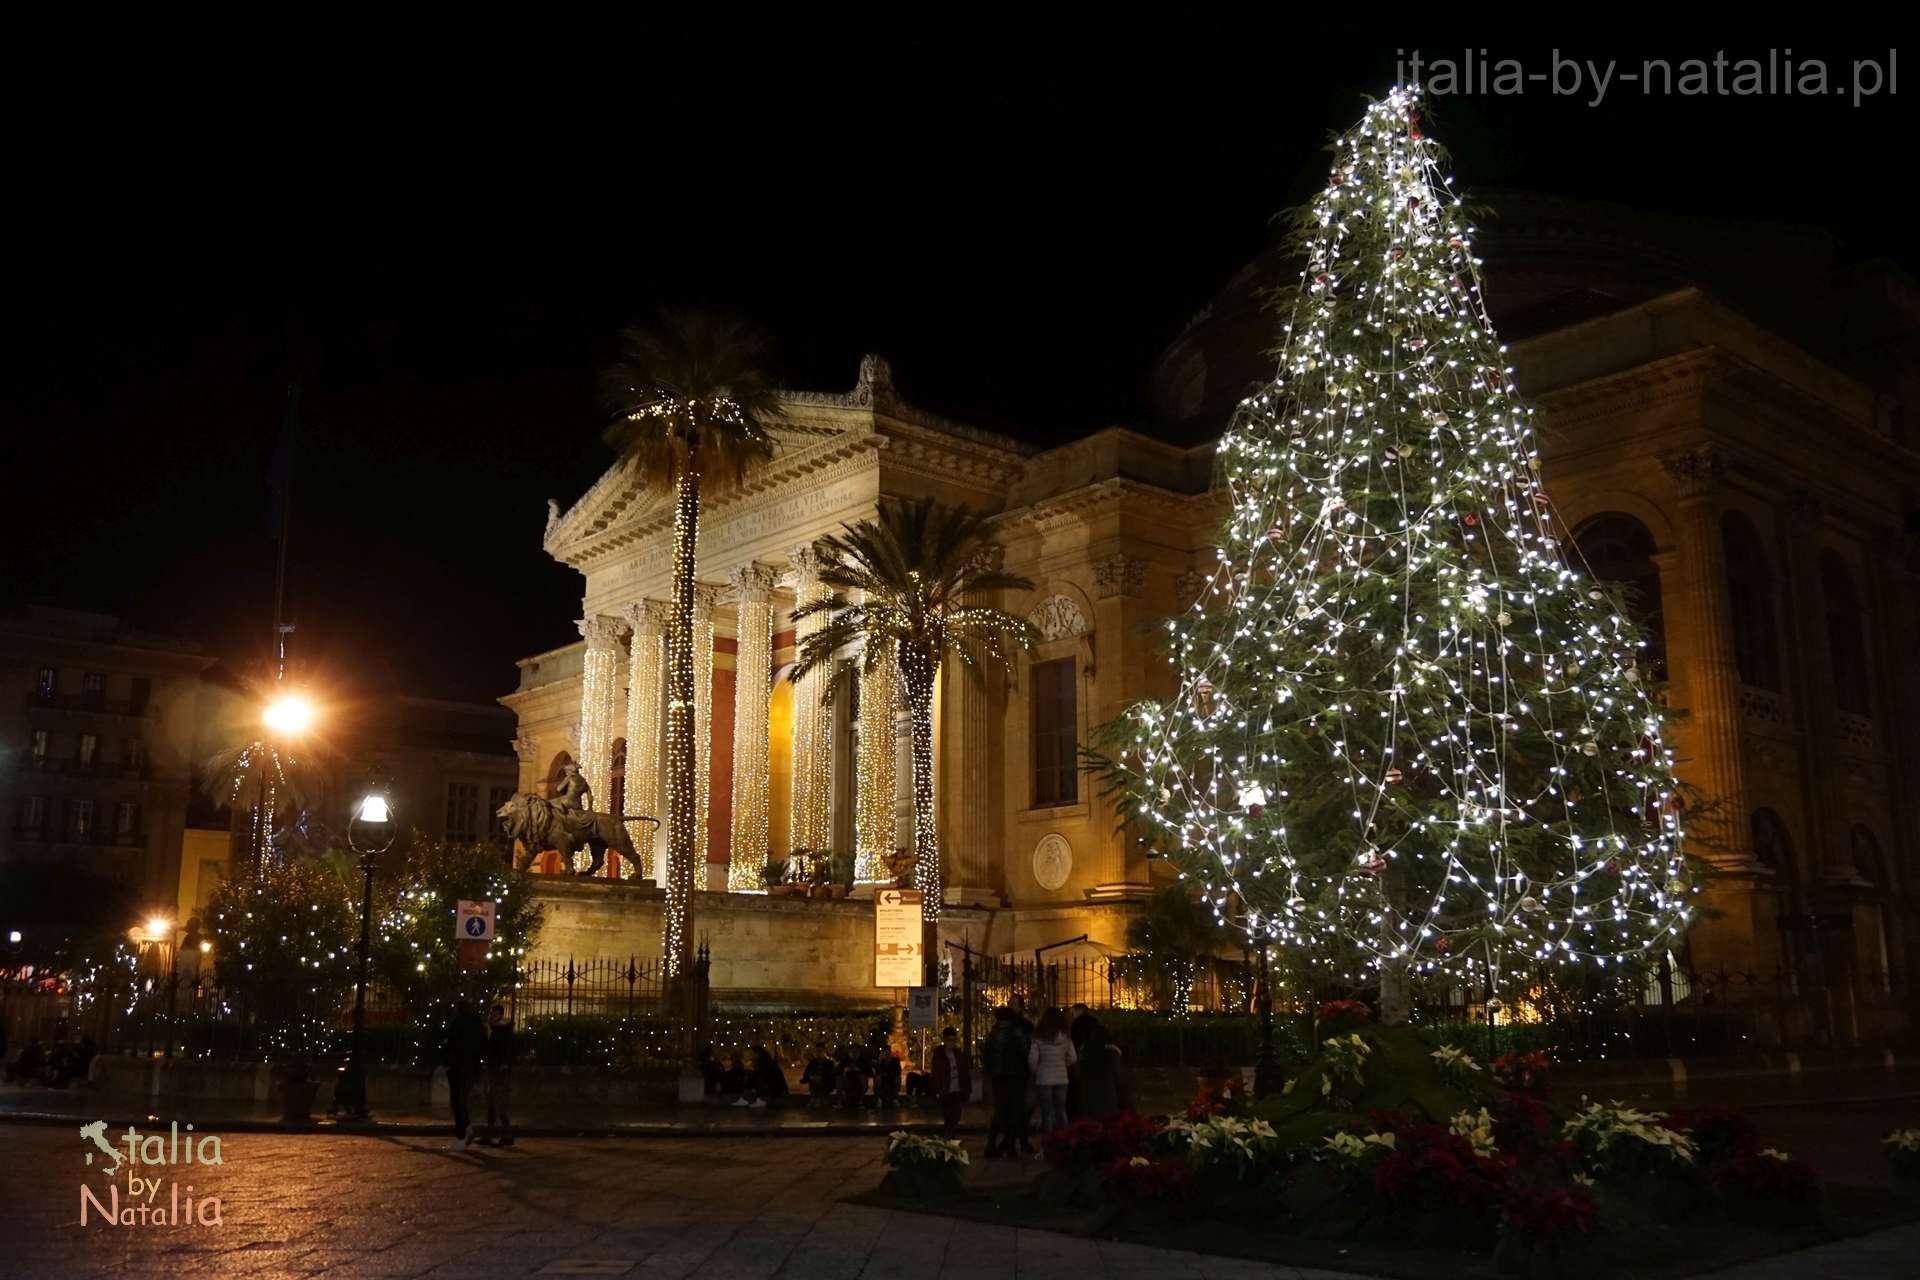 Palermo Sycylia grudzien december christmas święta Teatro Massimo